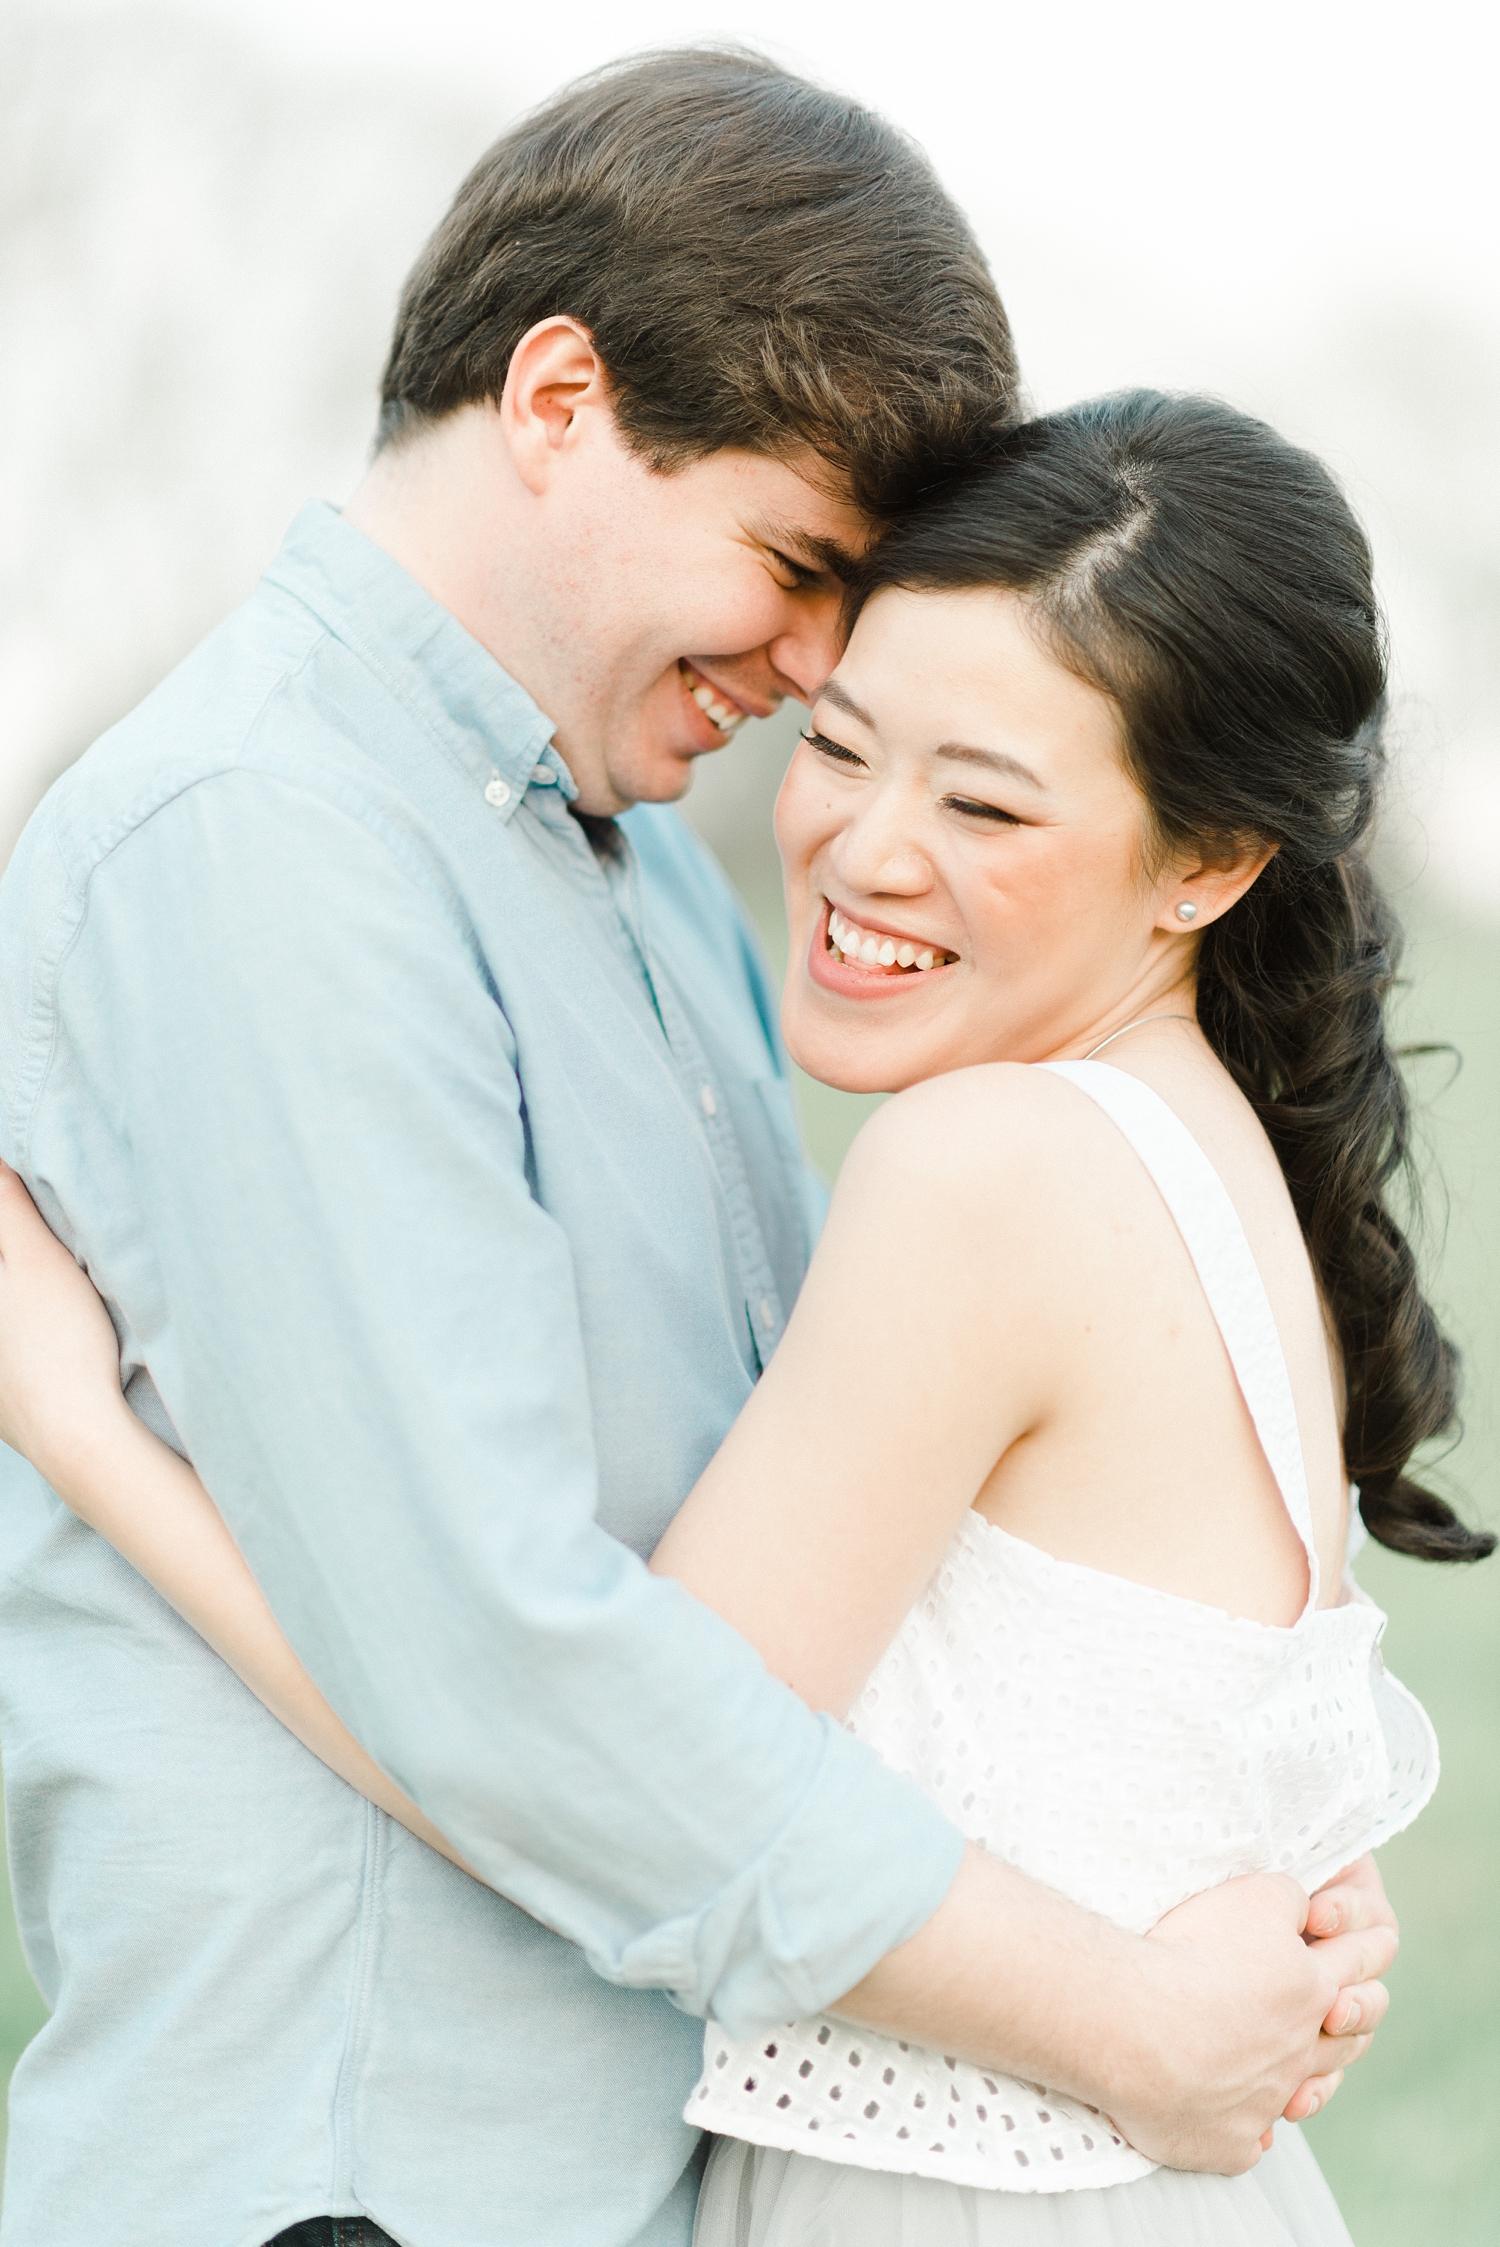 ash_lawn_charlottesville_couples_portraits_0014.jpg